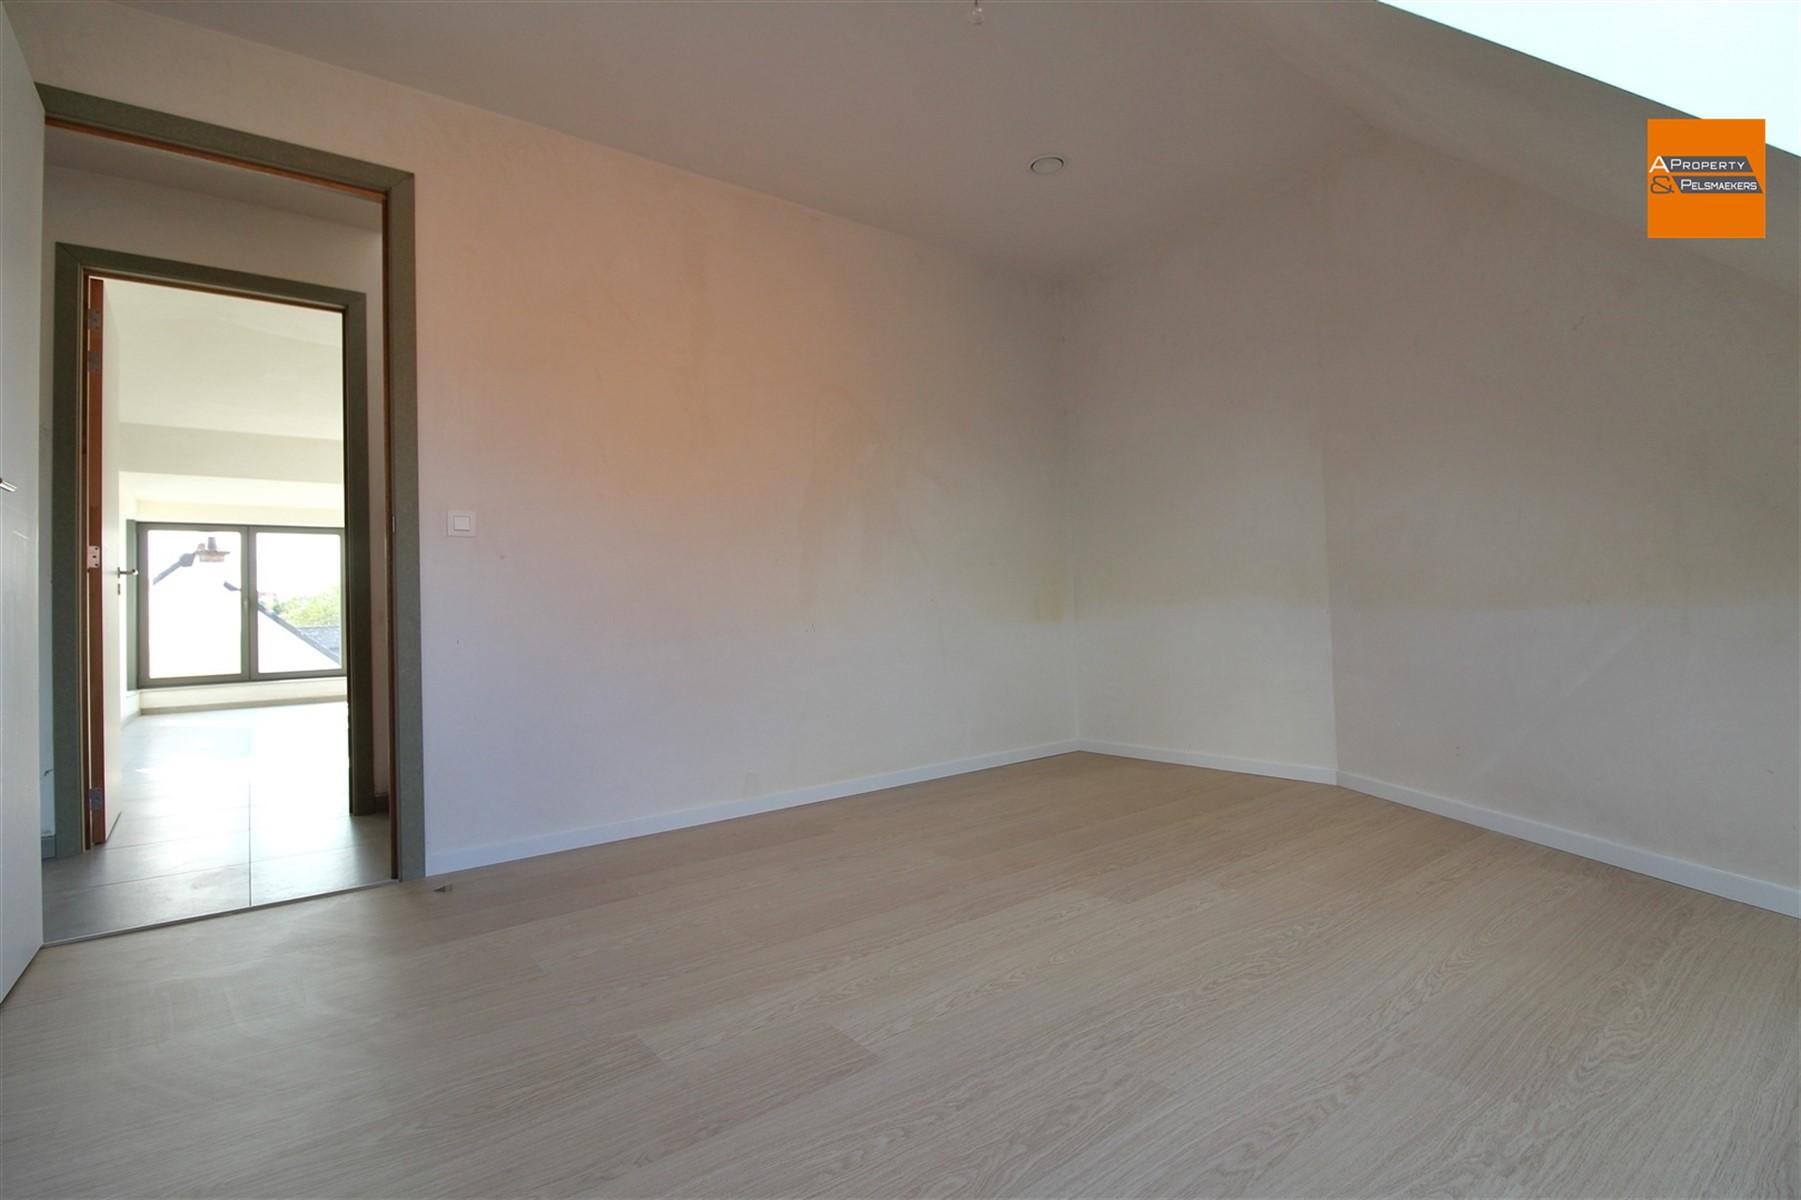 Foto 13 : Duplex/triplex in 3060 BERTEM (België) - Prijs € 319.000